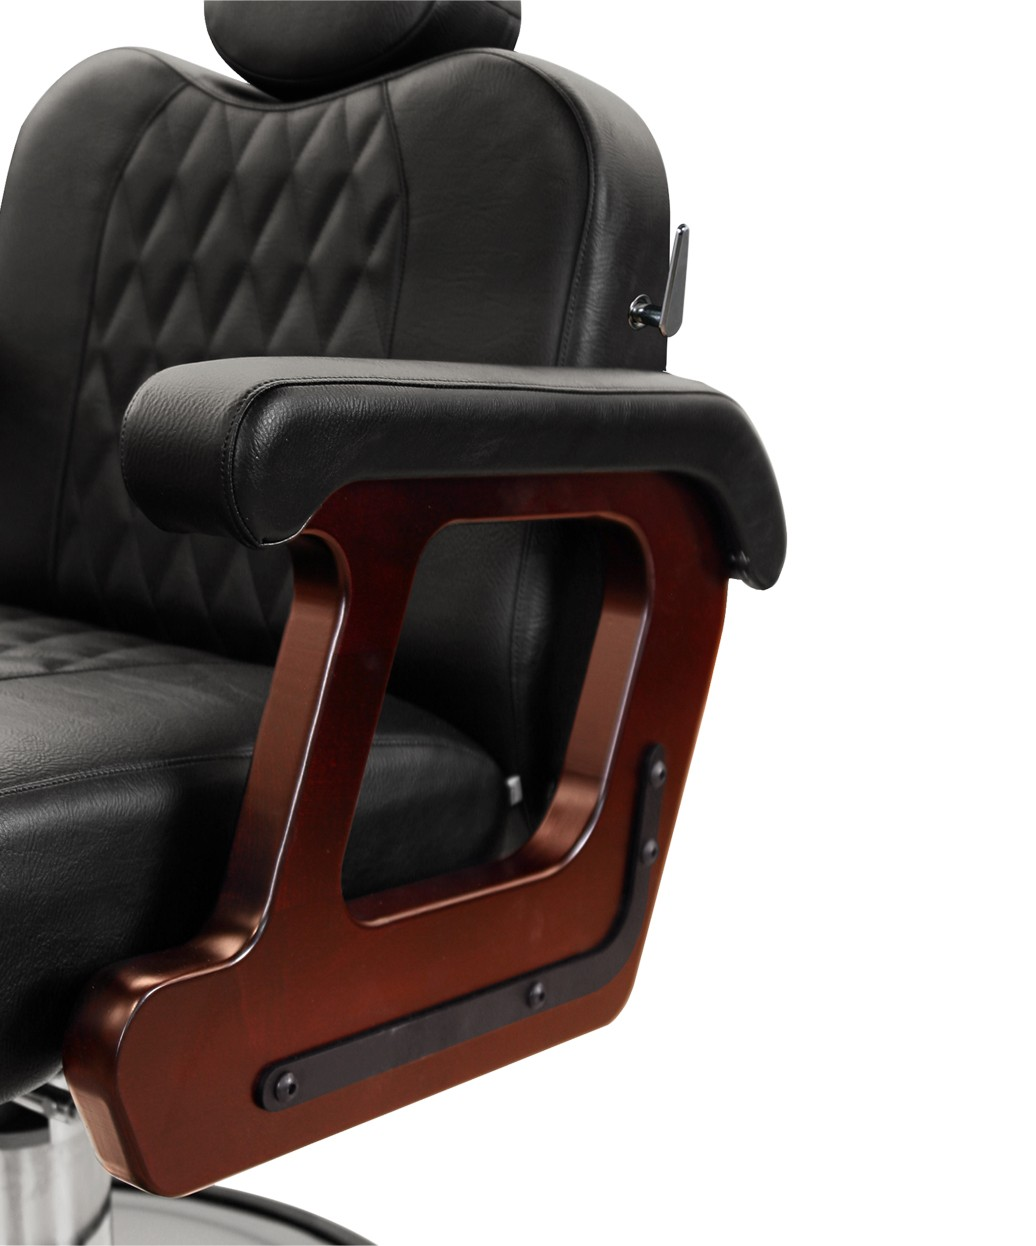 Collins B60 Commander Supreme Barber Chair w/ Calf Pad Legrest